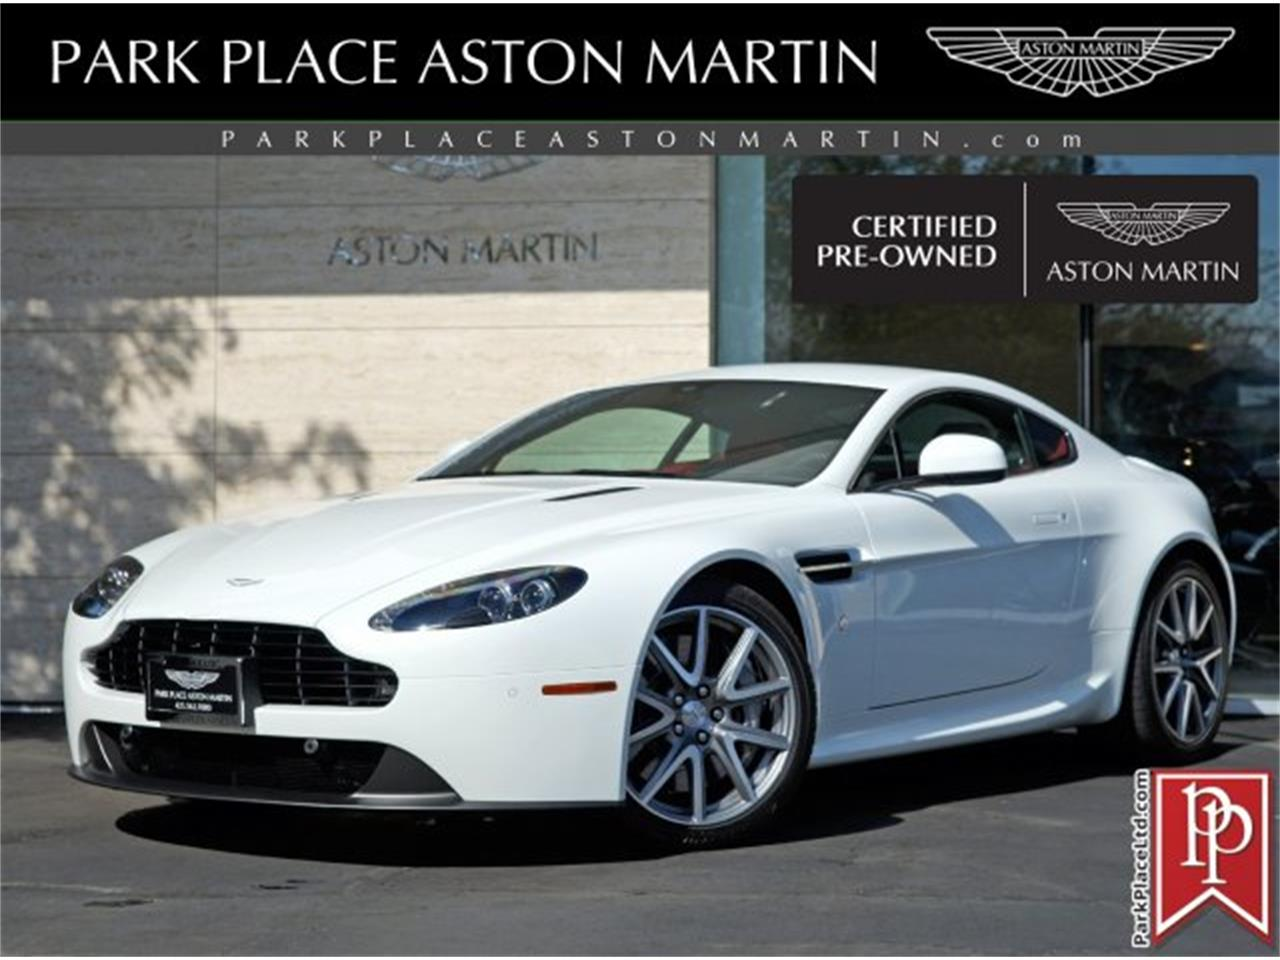 2013 Aston Martin Vantage For Sale In Bellevue Wa Classiccarsbay Com